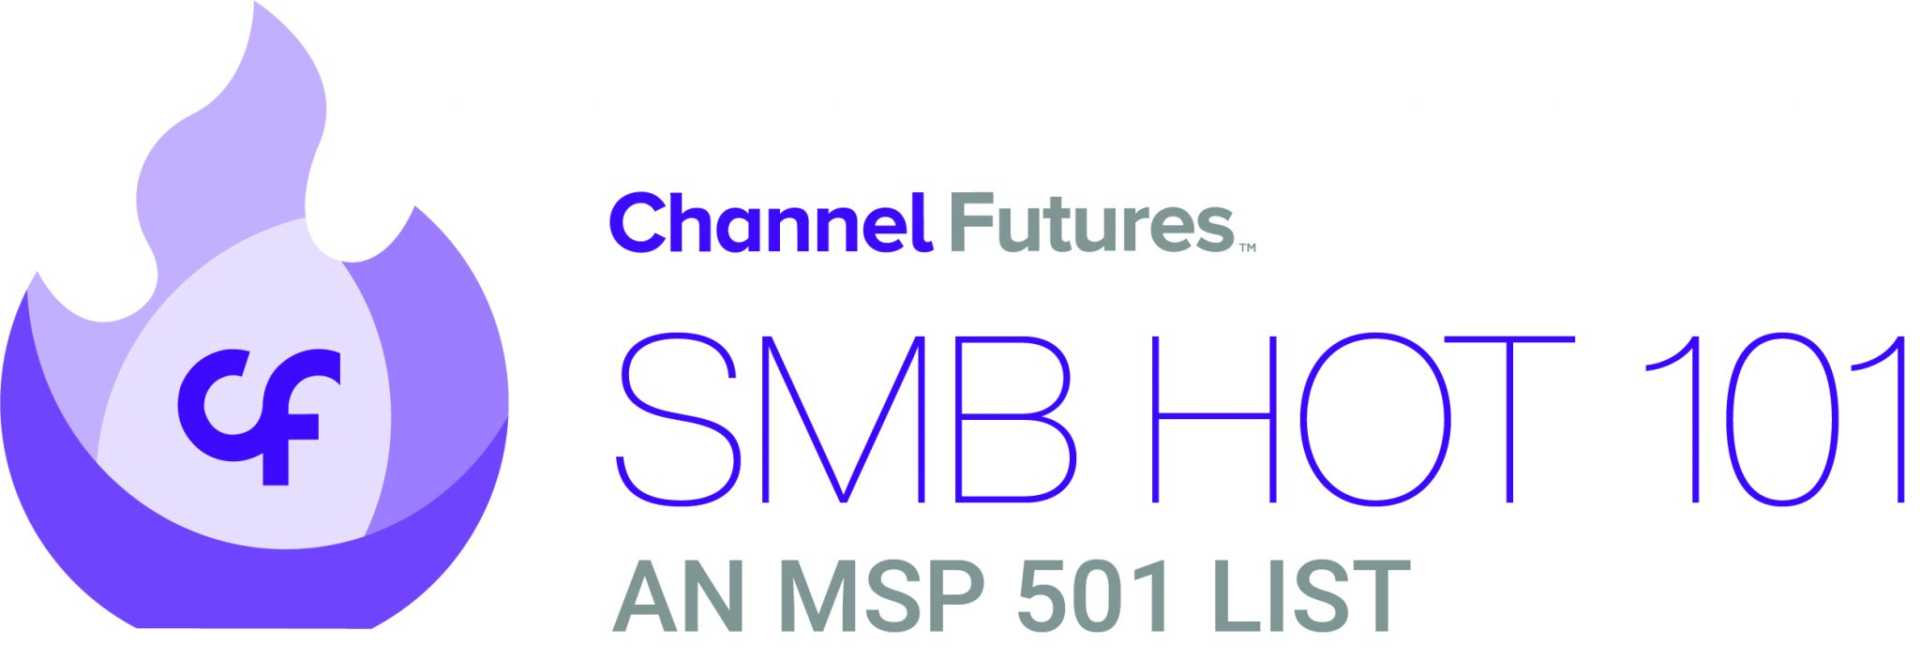 SMB Hot 100